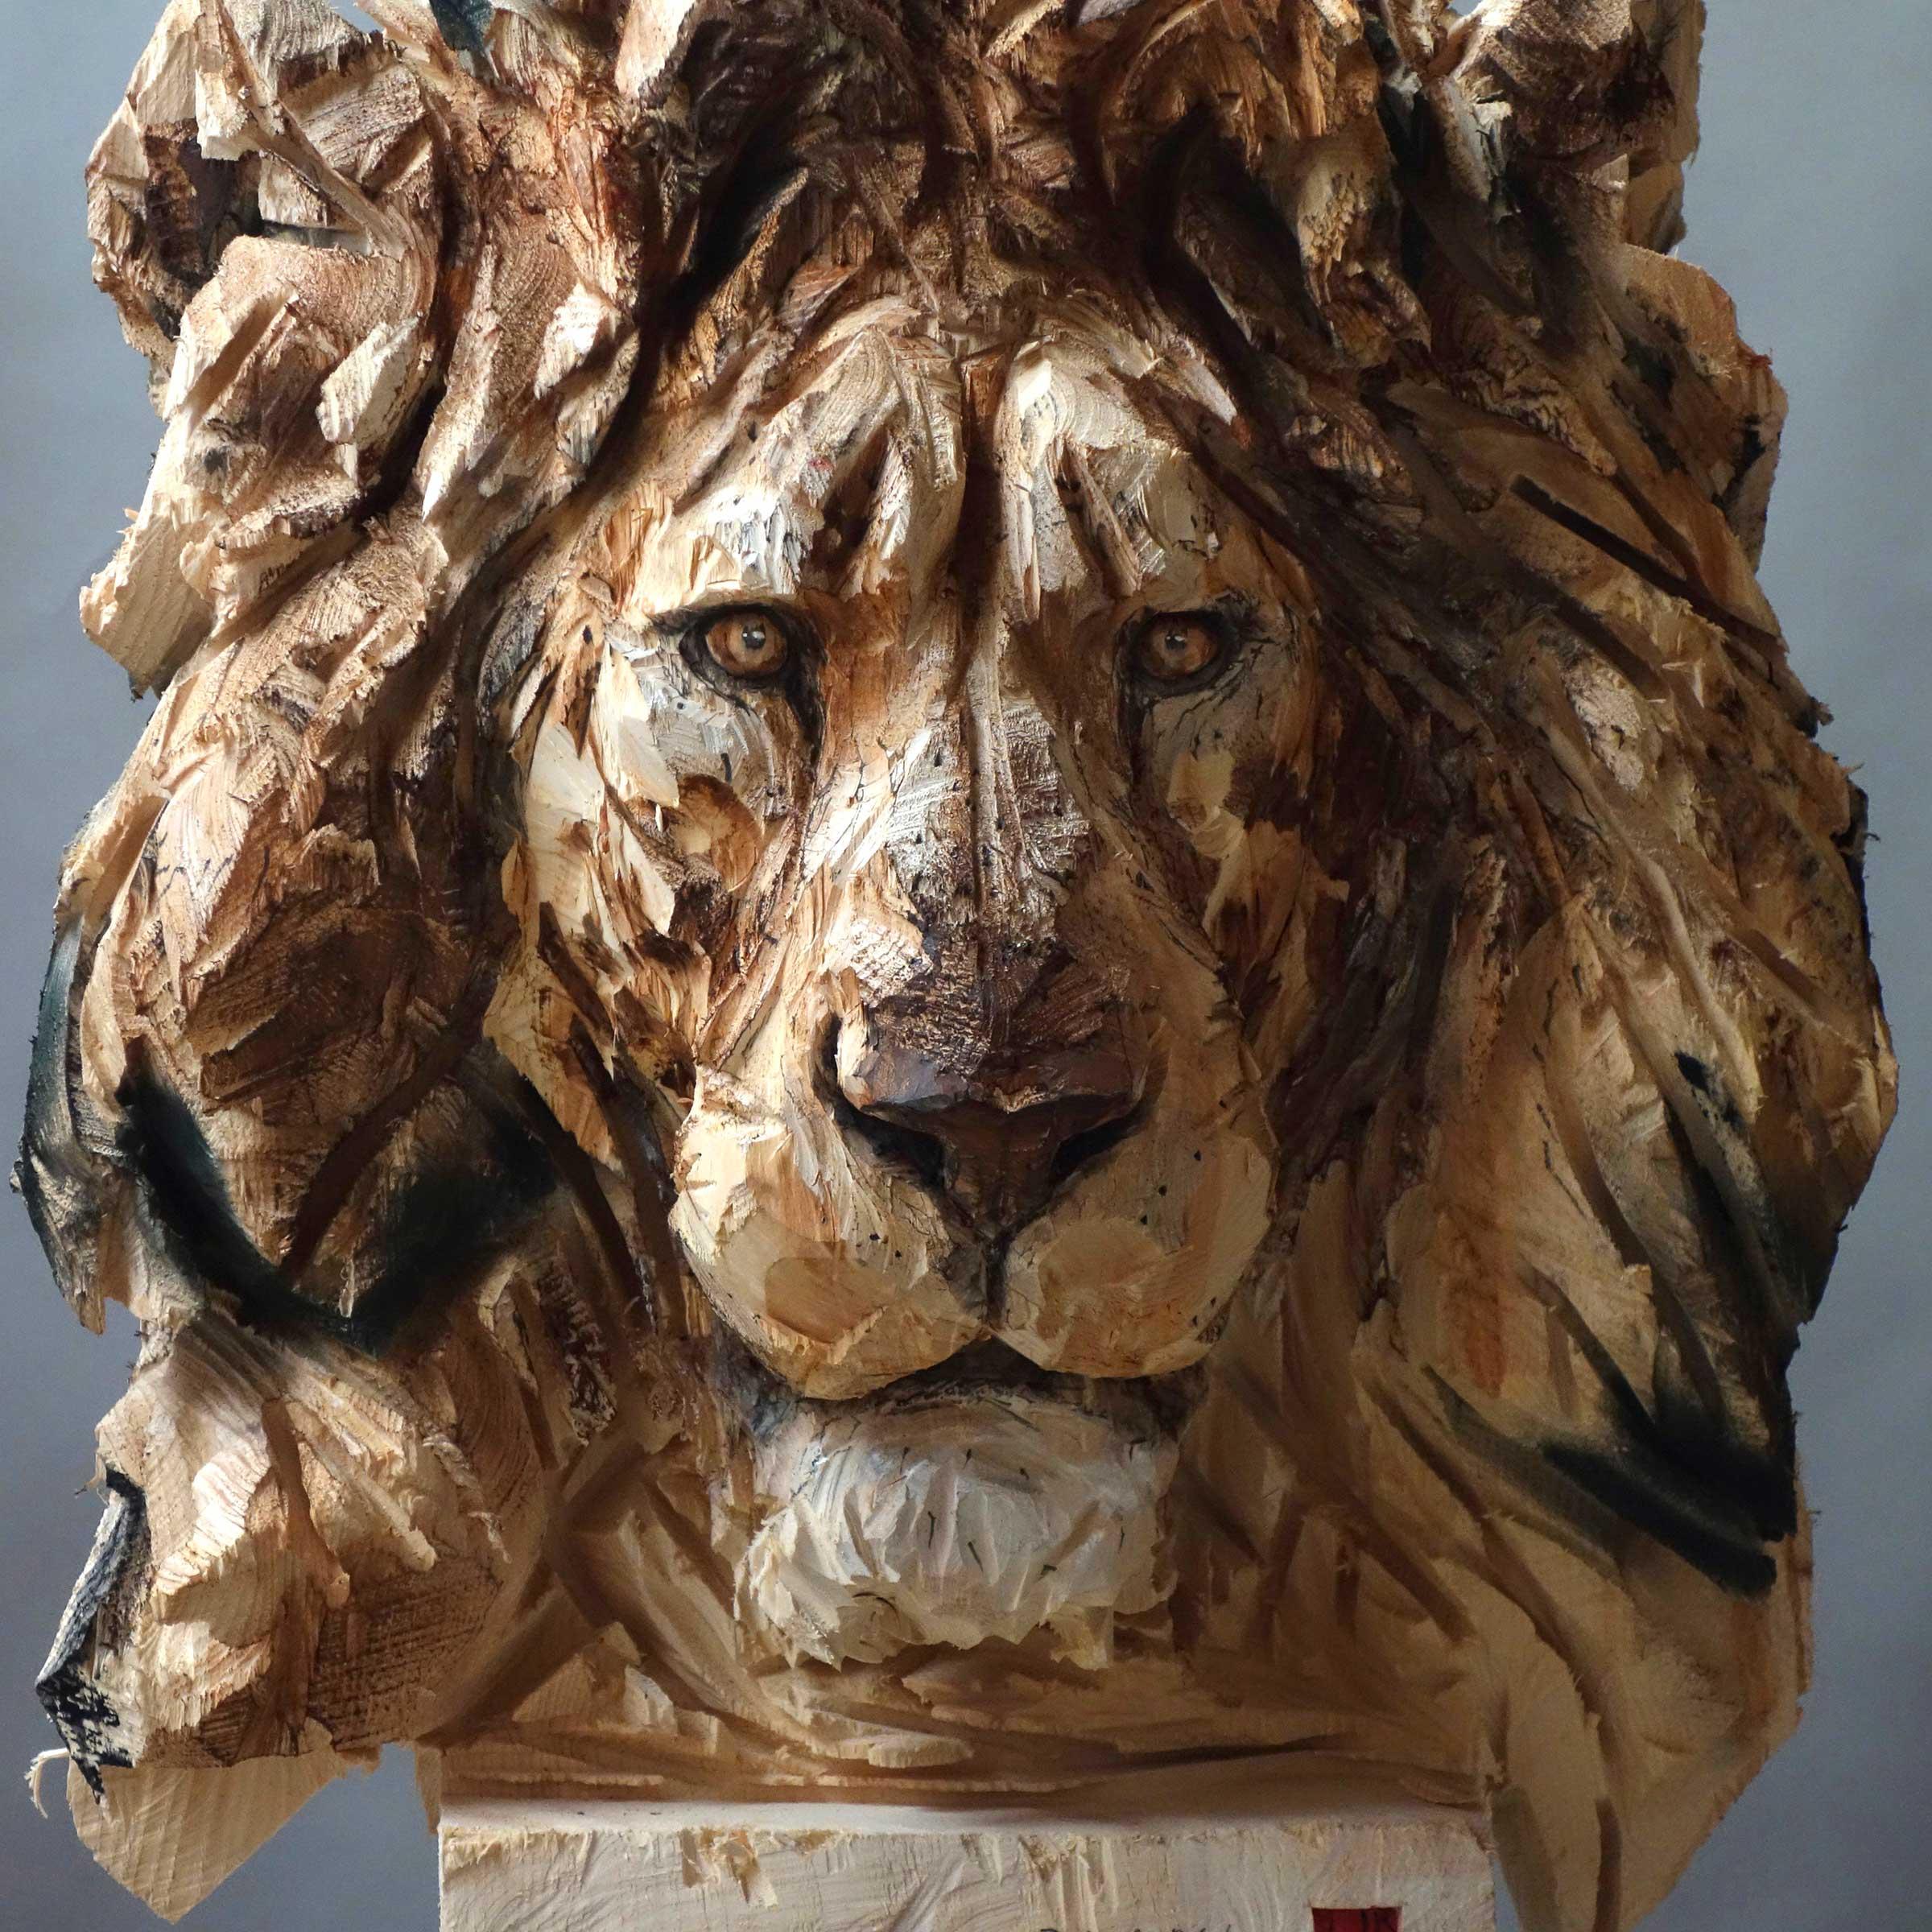 Jürgen Lingl-Rebetez - Buste De Lion, detail - Leonhard's Gallery